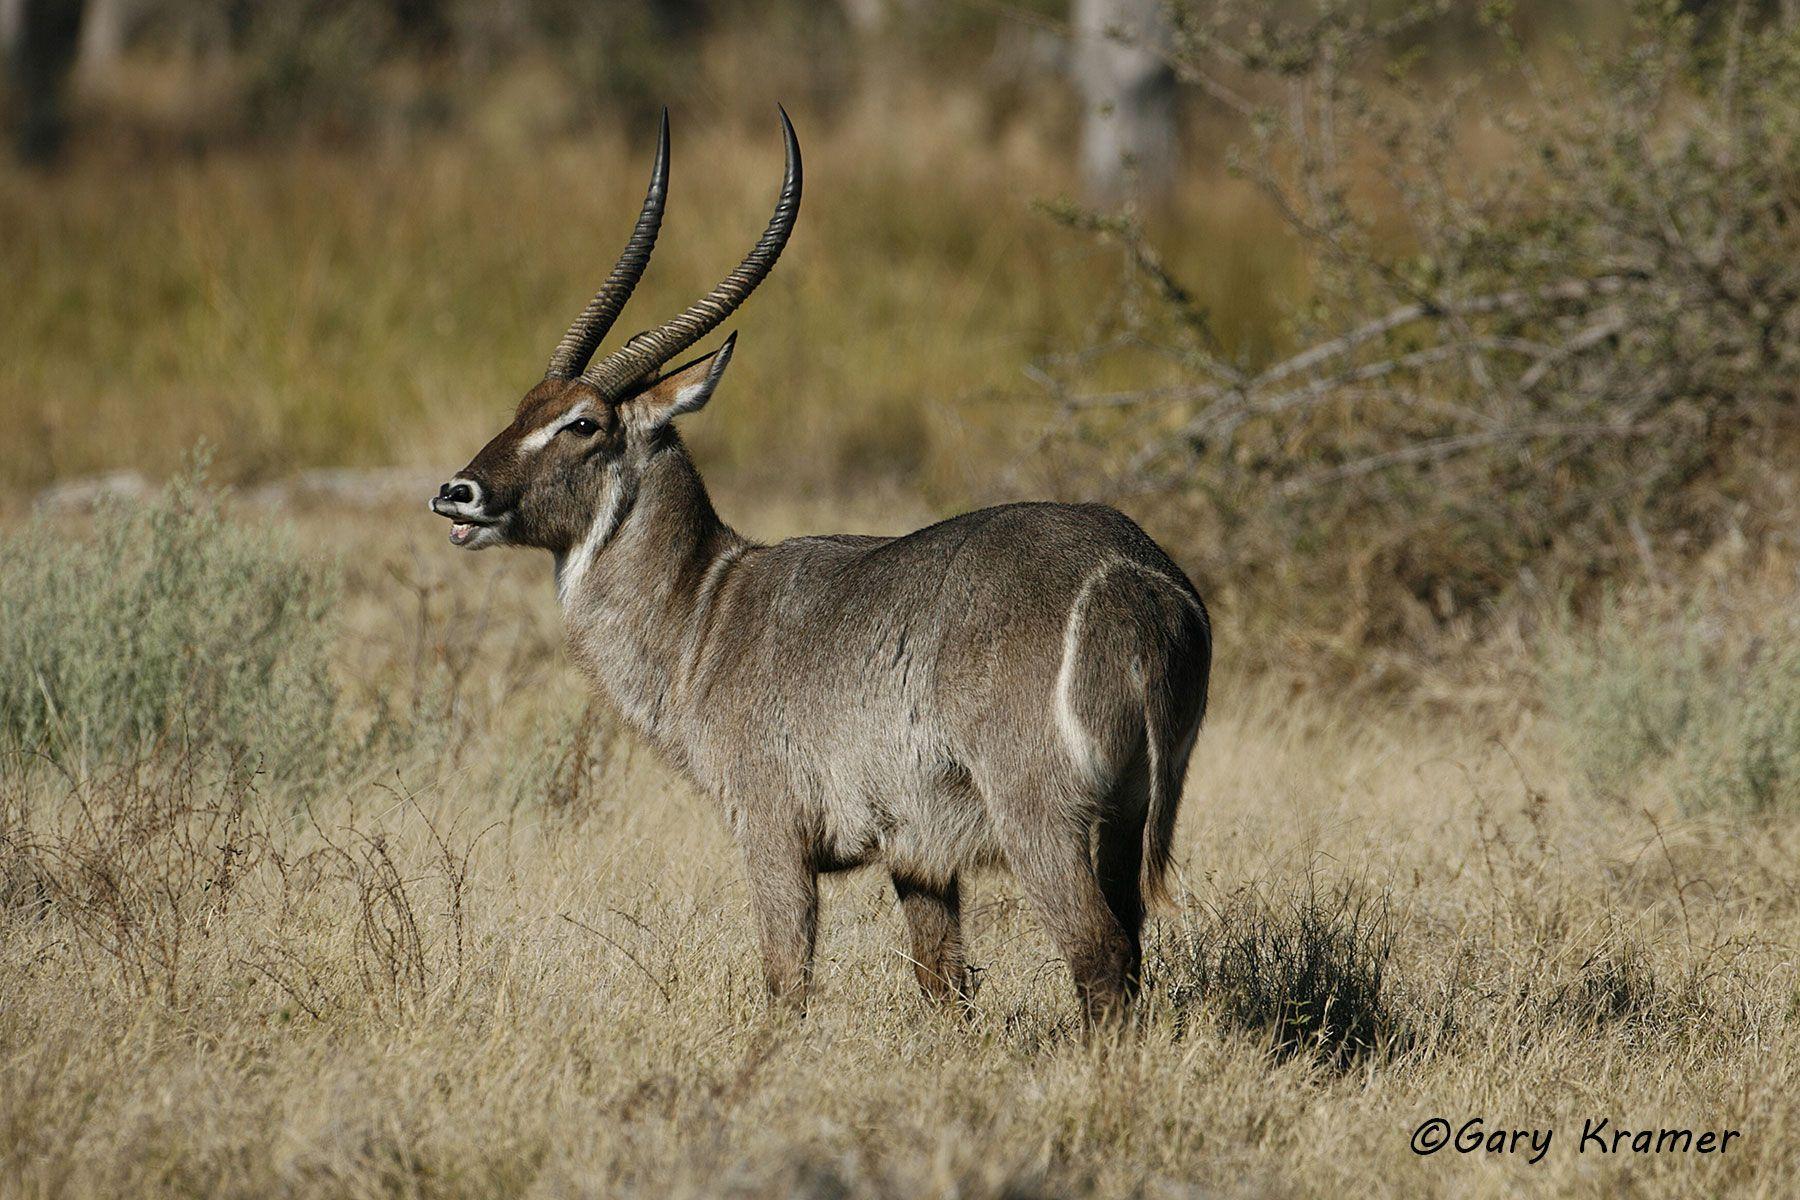 Common Waterbuck (Kobus ellipsiprymnus) - AMUW#128d